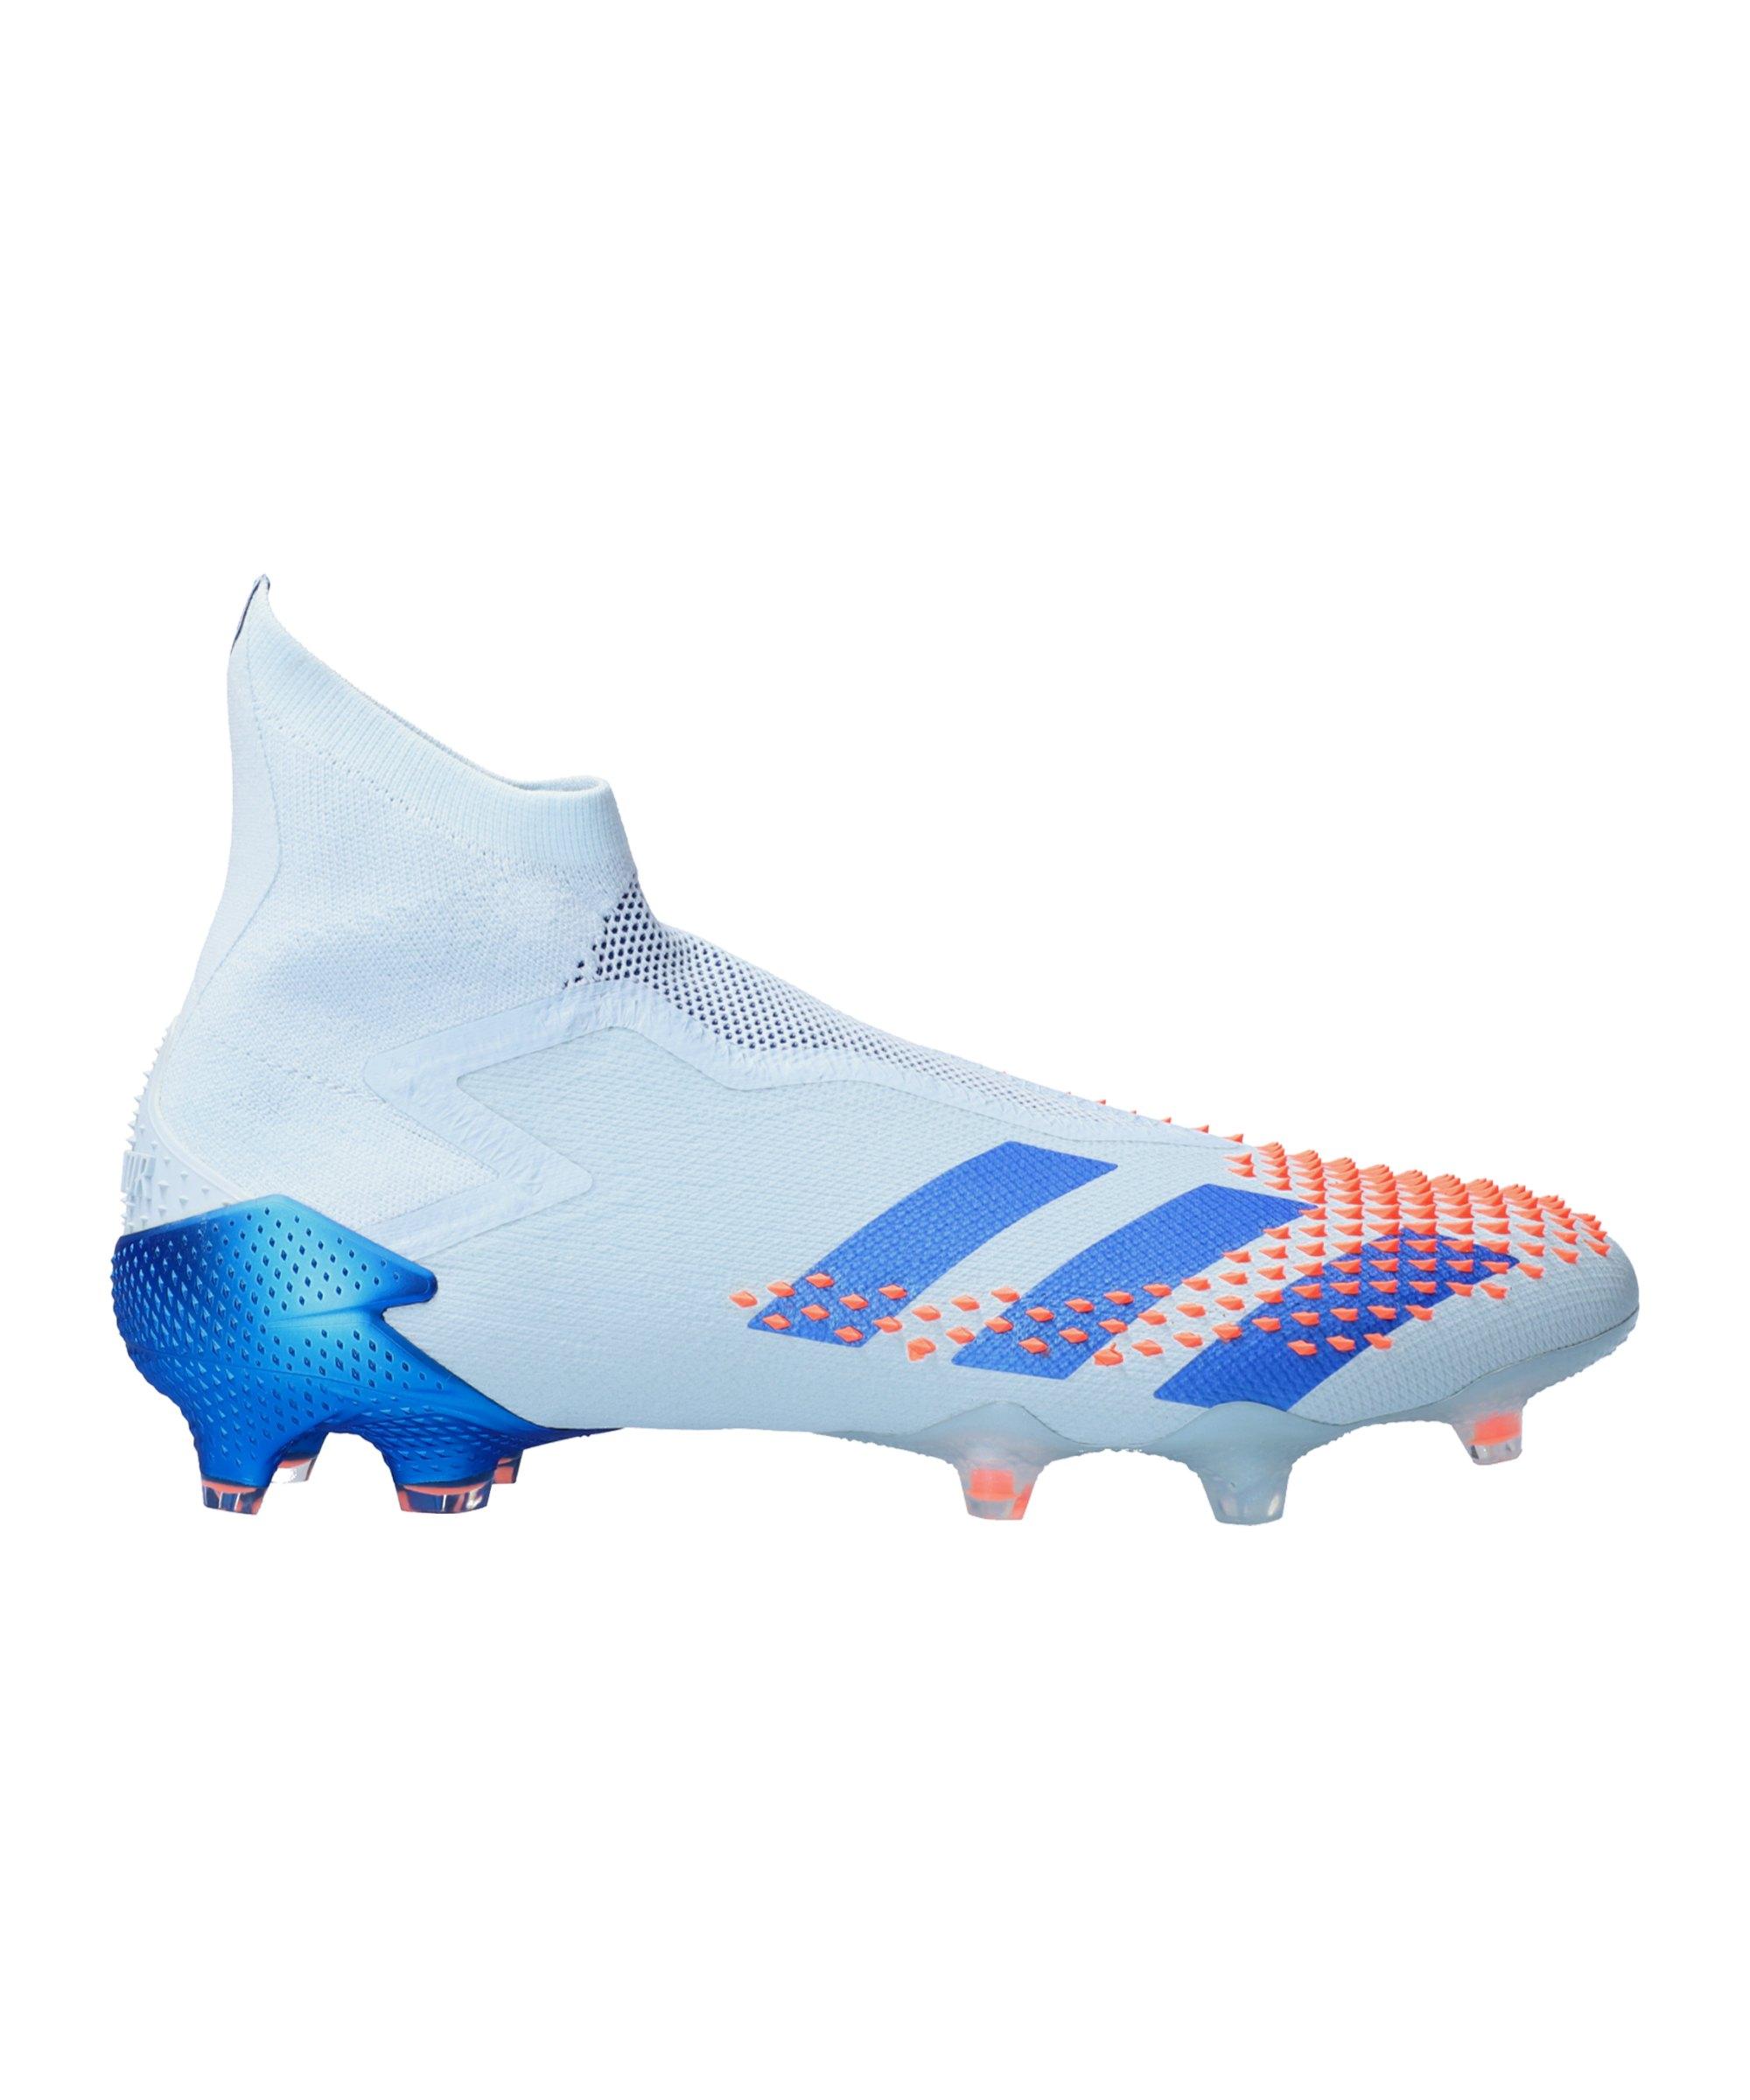 adidas Predator Glory Hunter 20+ FG Blau Orange - blau